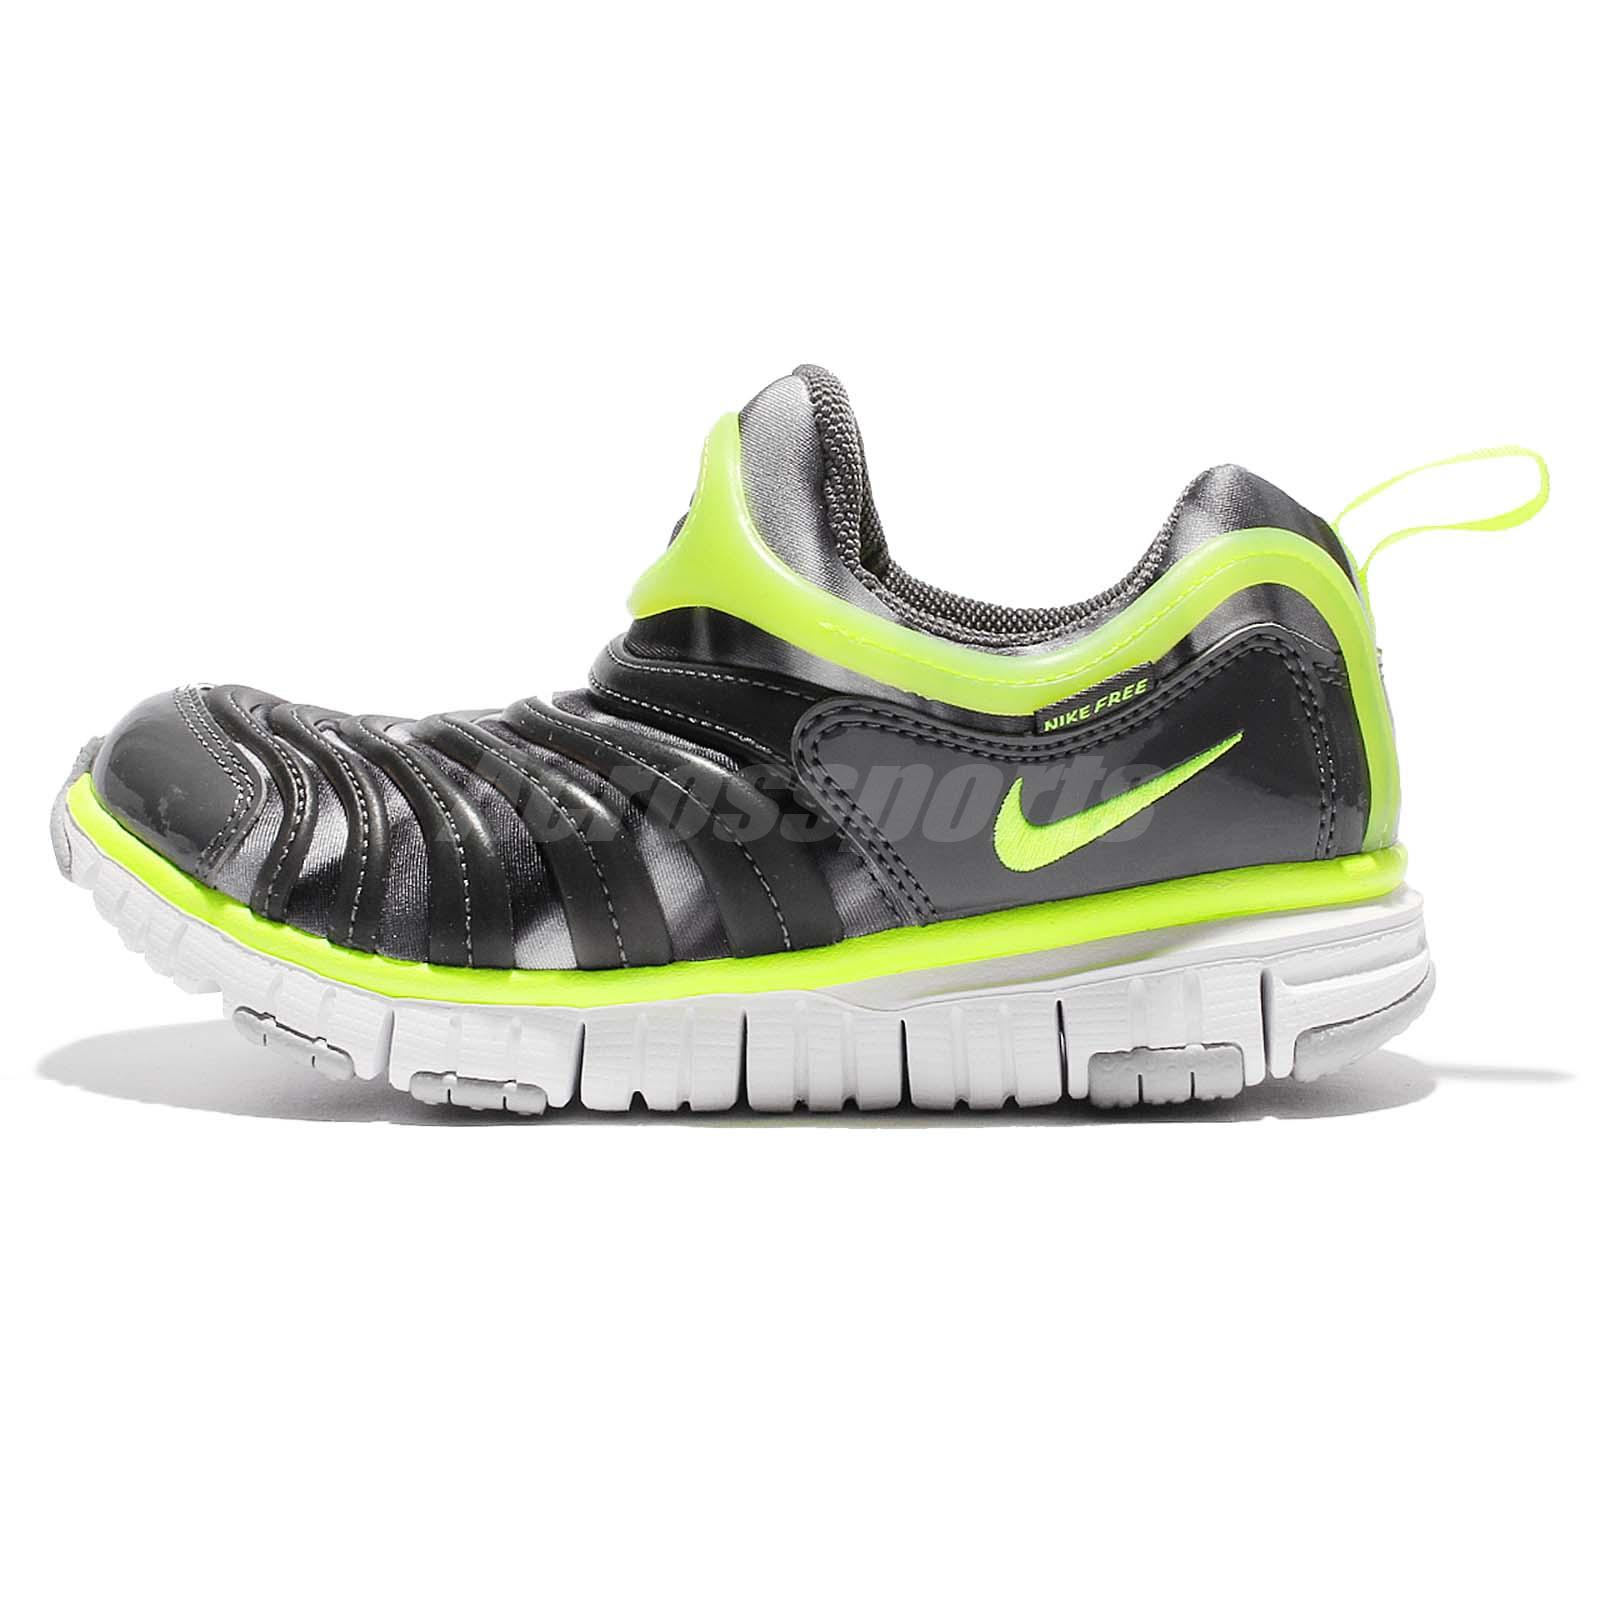 free shipping 3c7d9 7cf69 ... netherlands nike dynamo free print ps grey green preschool boys running  shoes 834365 001 cc274 c7a6d